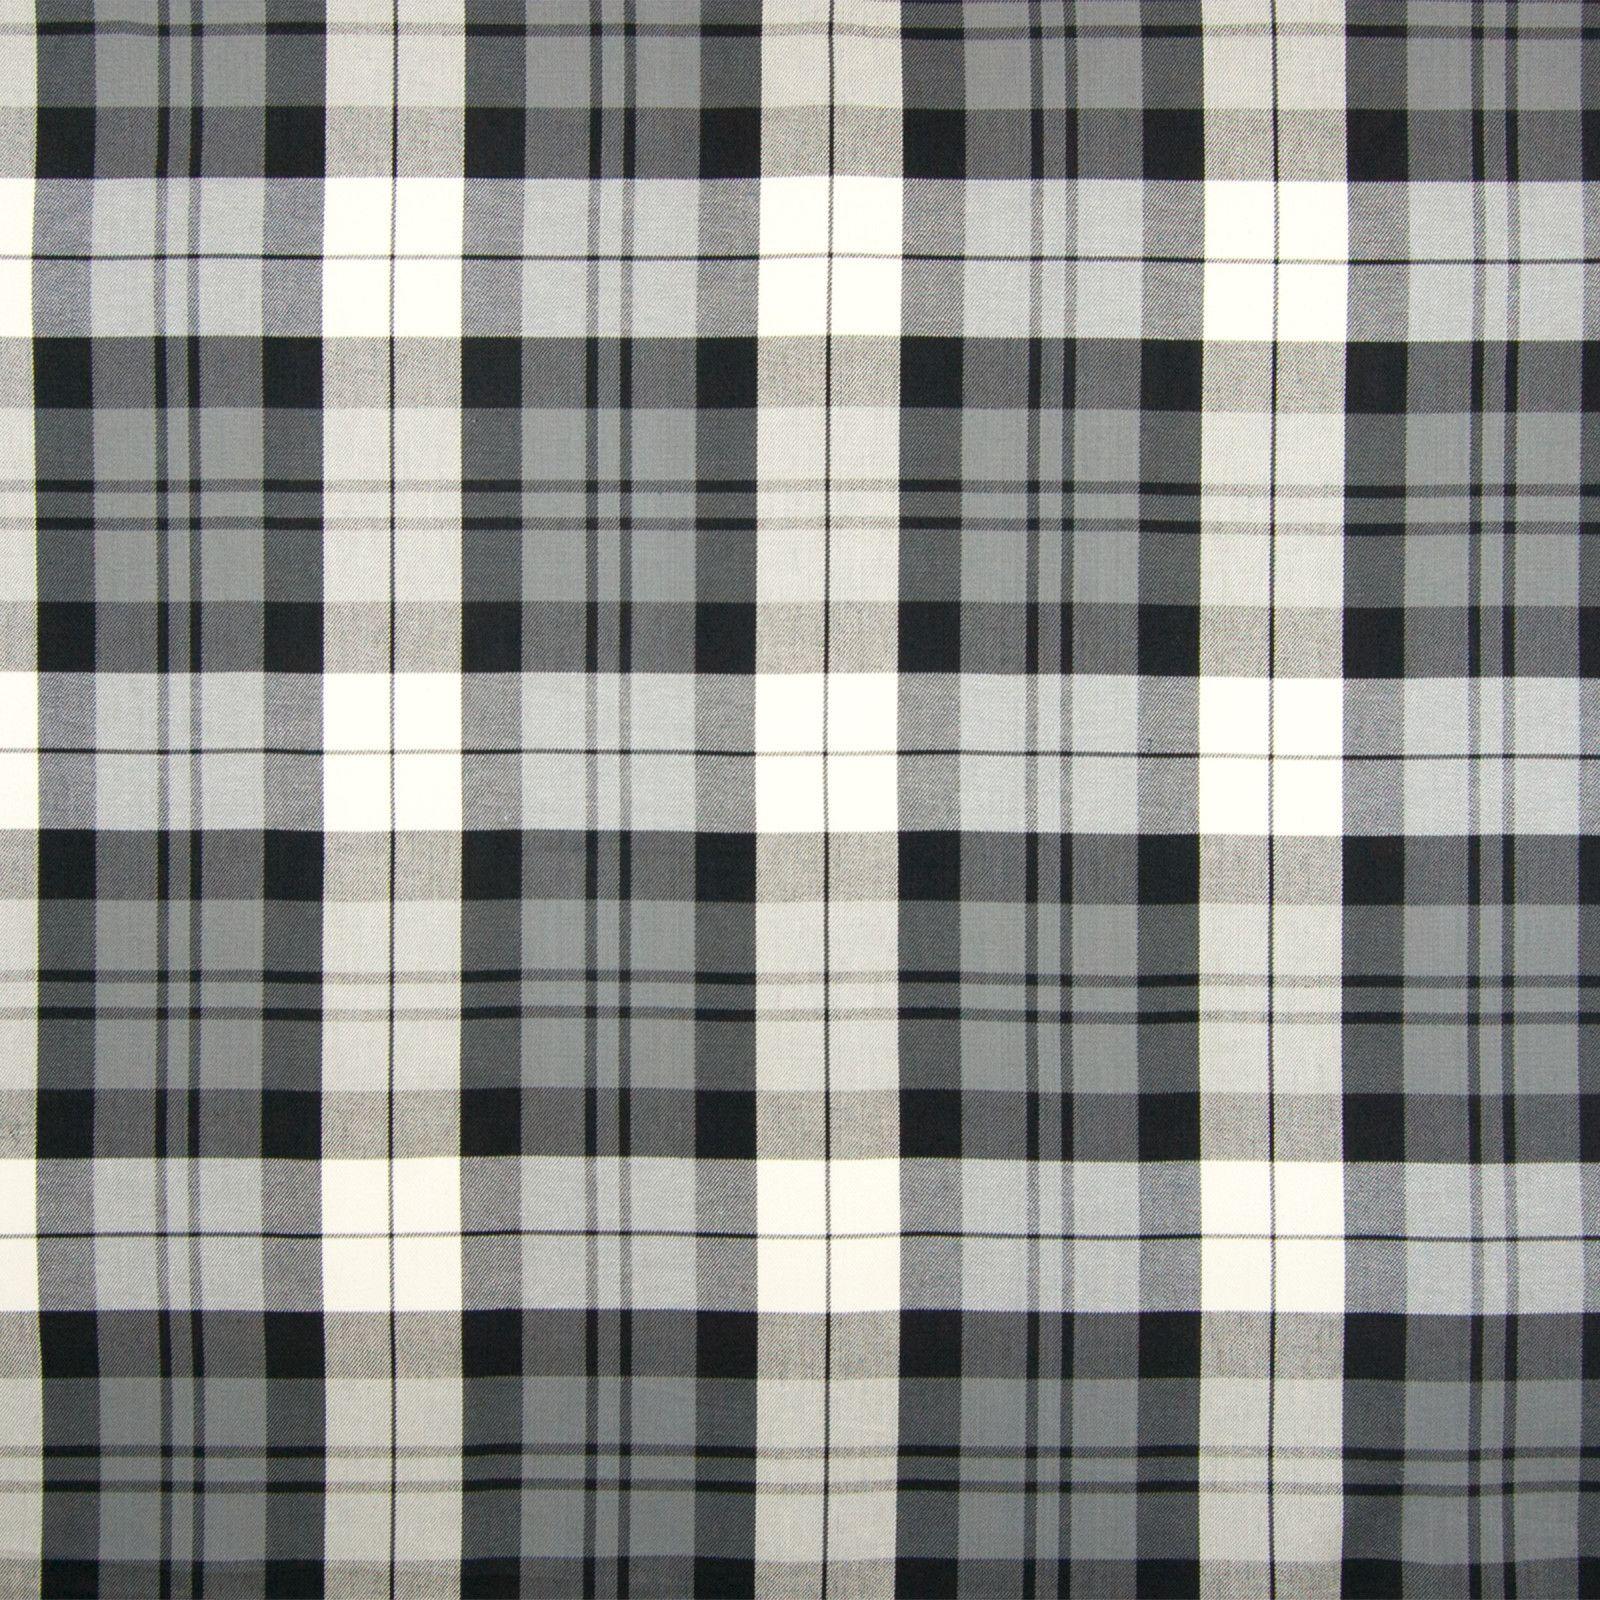 B6682 Jet Tartans Plaids Checks Greenhouse Fabrics